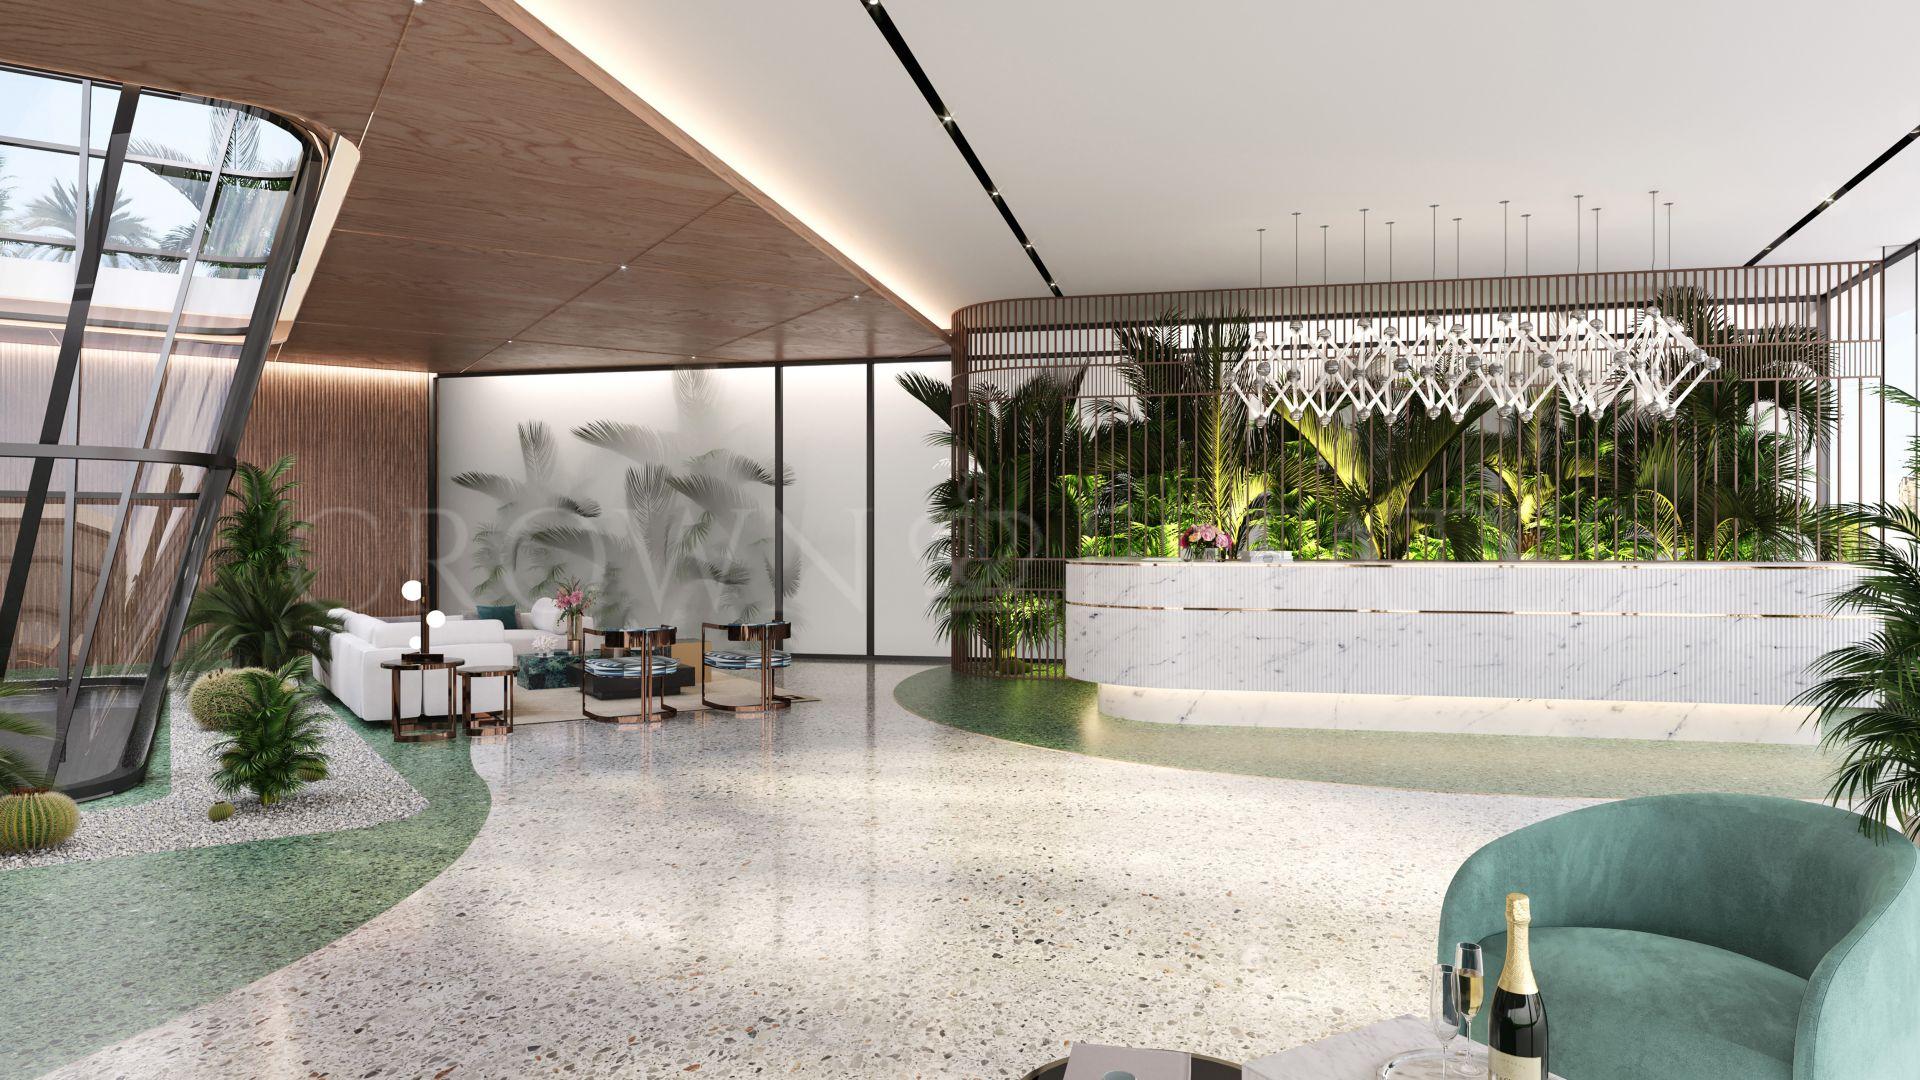 EPIC Marbella - Defining True Luxury in Marbella